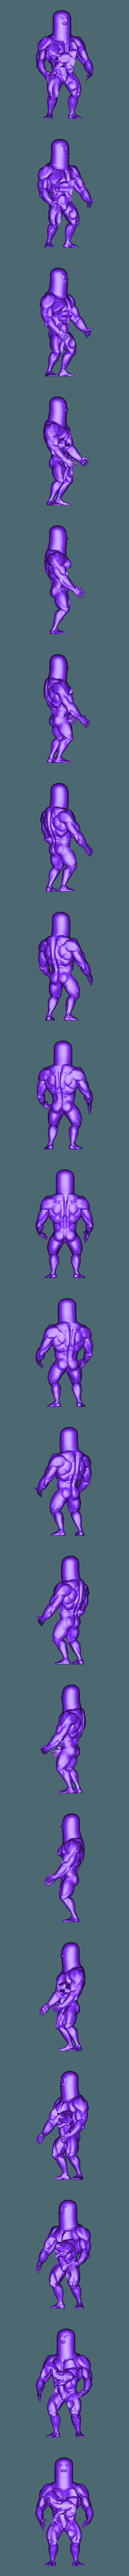 dugtrio medio.stl Download STL file Dugtrio Funny 3D print model • 3D print object, Vstudios